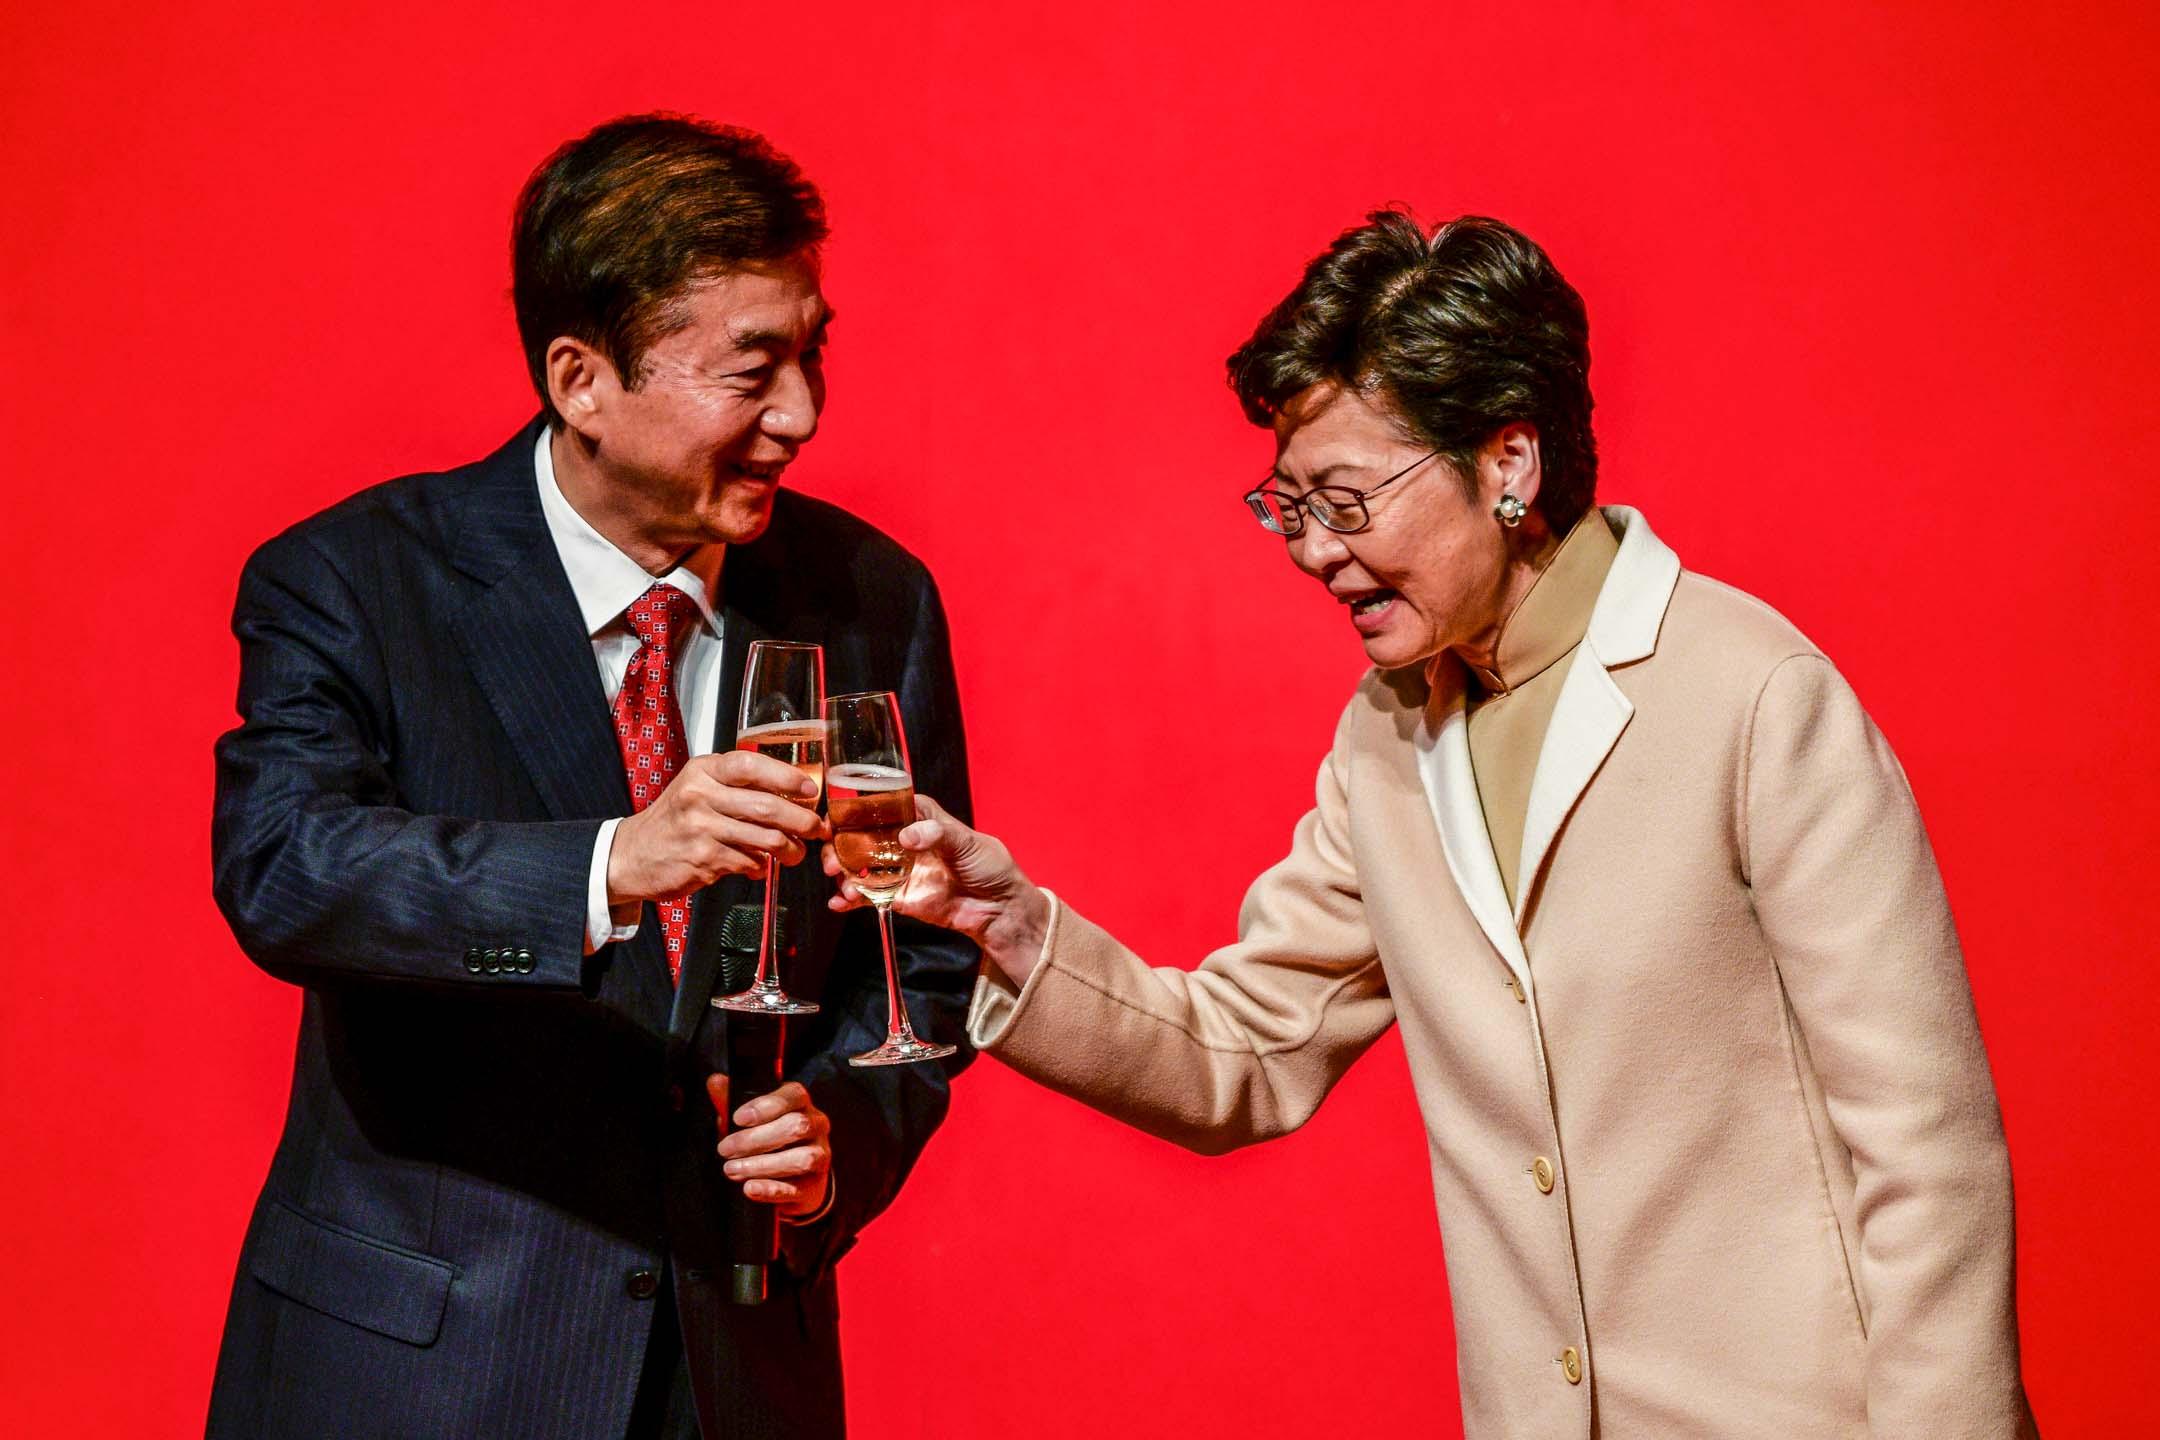 2020年1月15日,中聯辦新春酒會,中聯辦主任駱惠寧與特首林鄭月娥。 攝: Isaac Lawrence/AFP via Getty Images